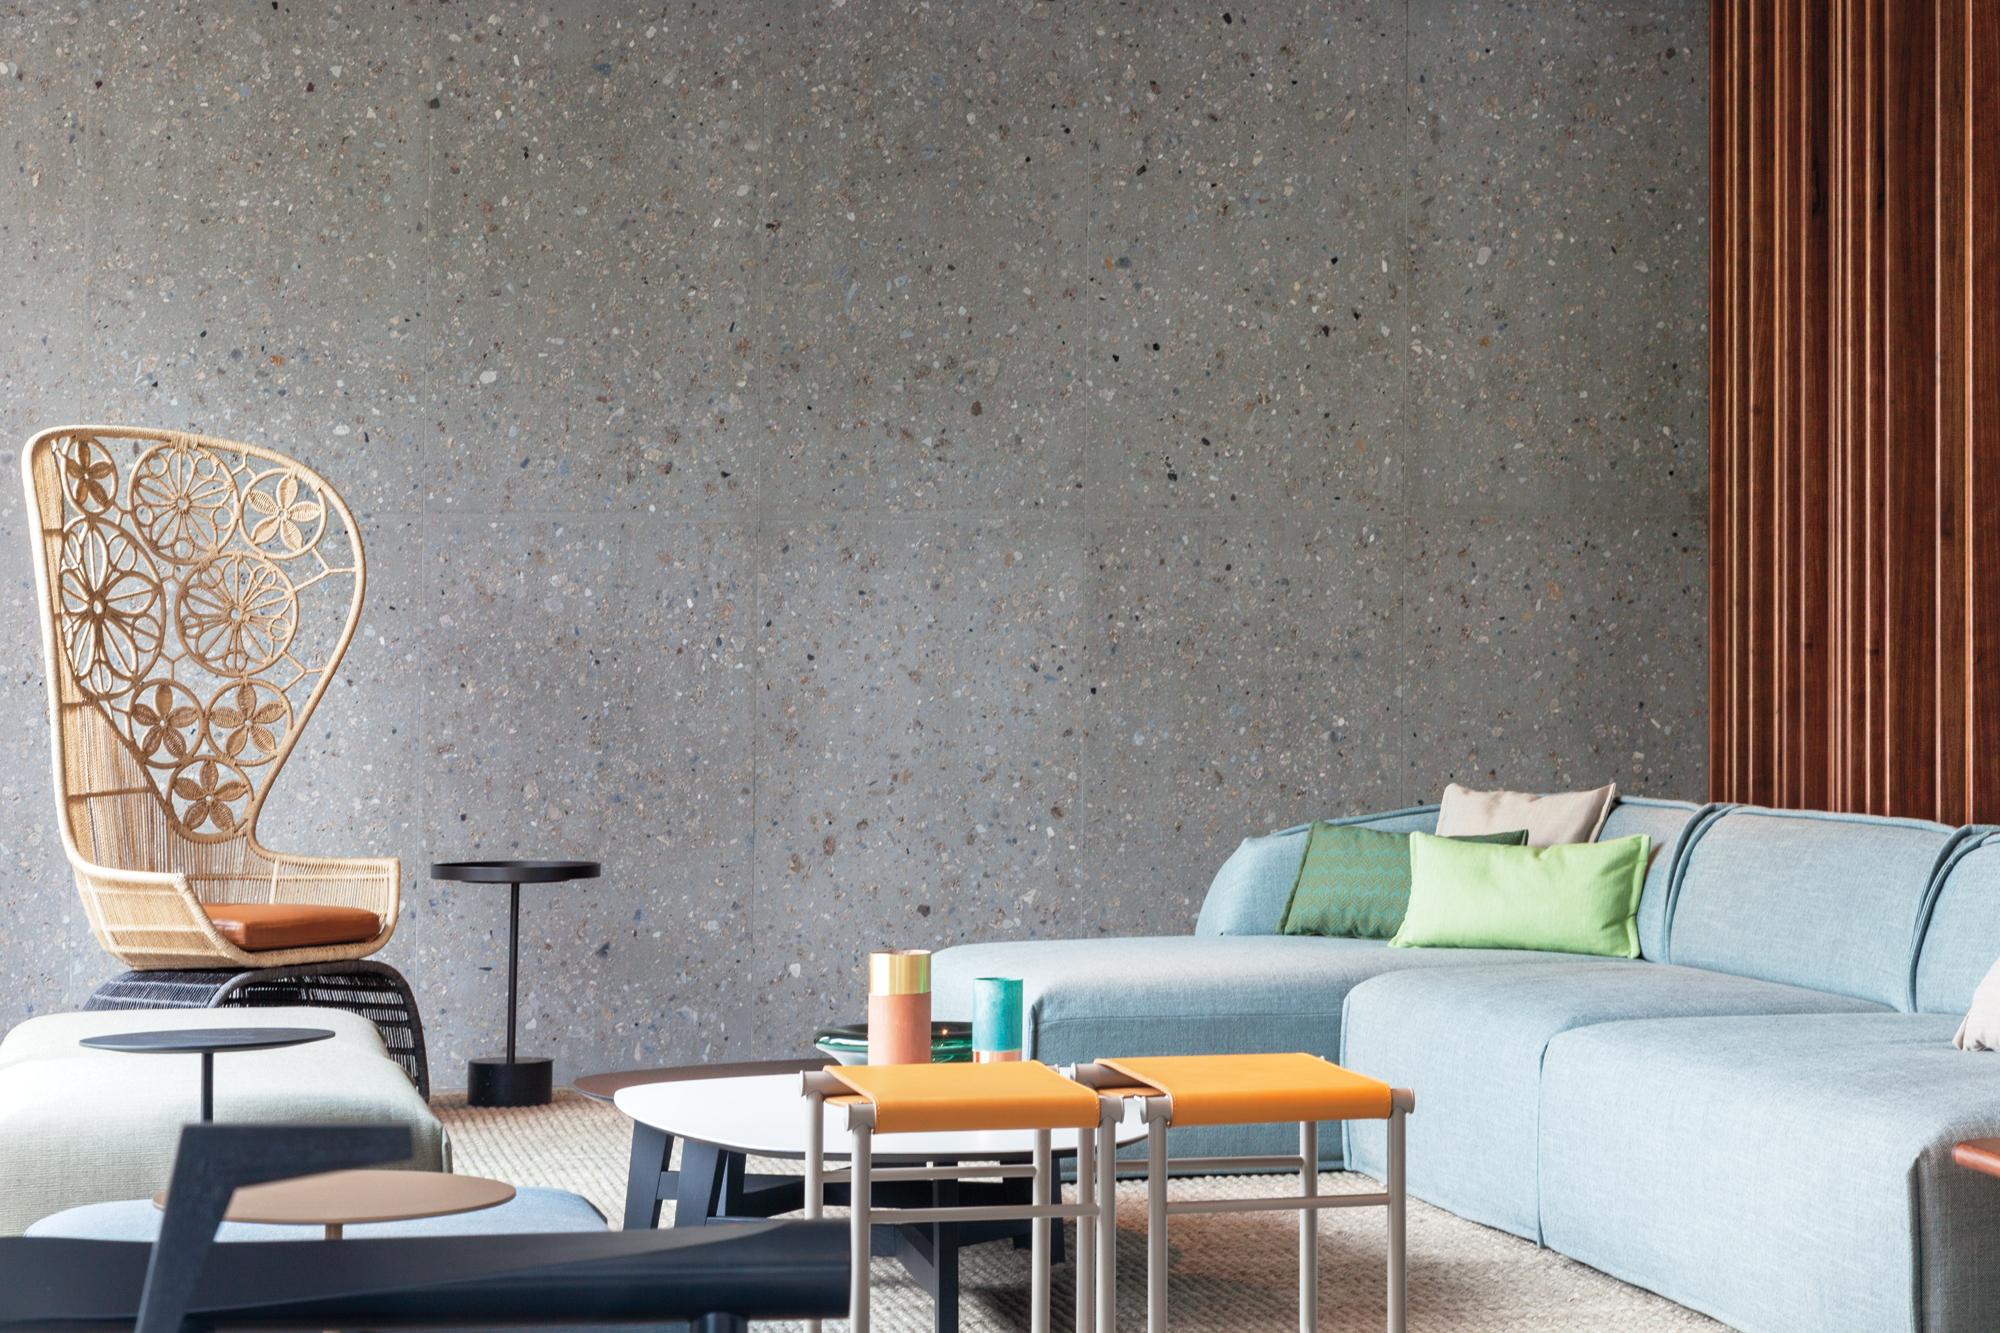 patricia urquiola designs idyllic lake como hotel il sereno. Black Bedroom Furniture Sets. Home Design Ideas